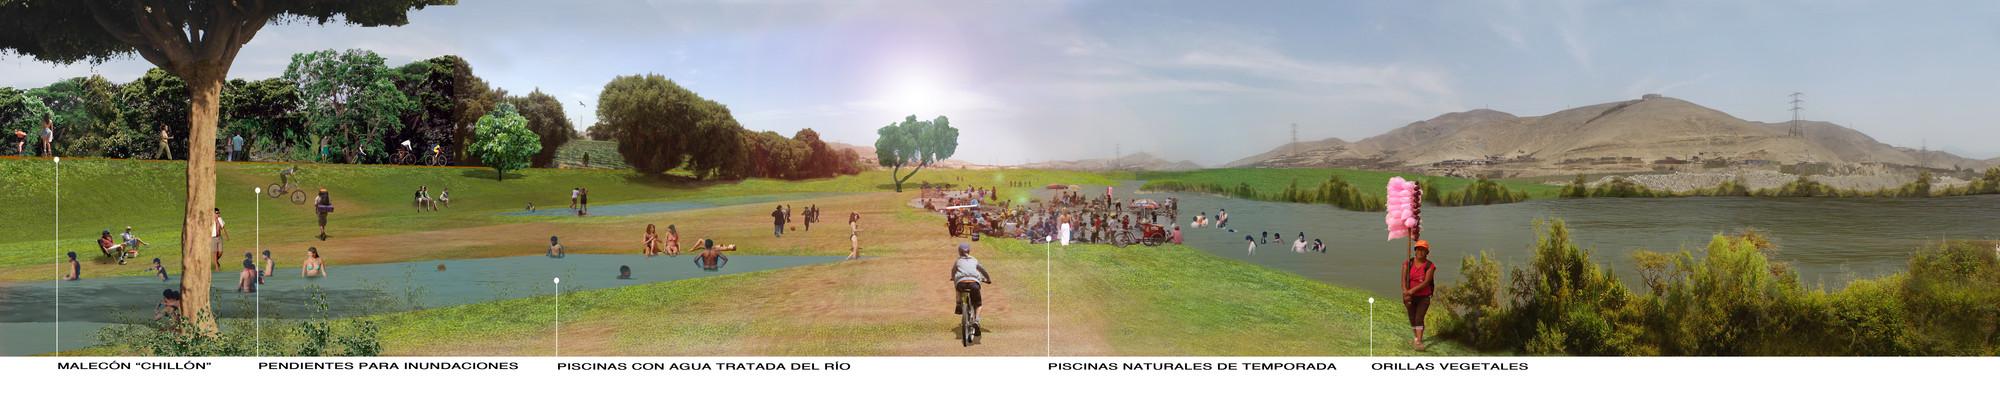 Imagen 02. Image Courtesy of ESTUDIO SHICRAS